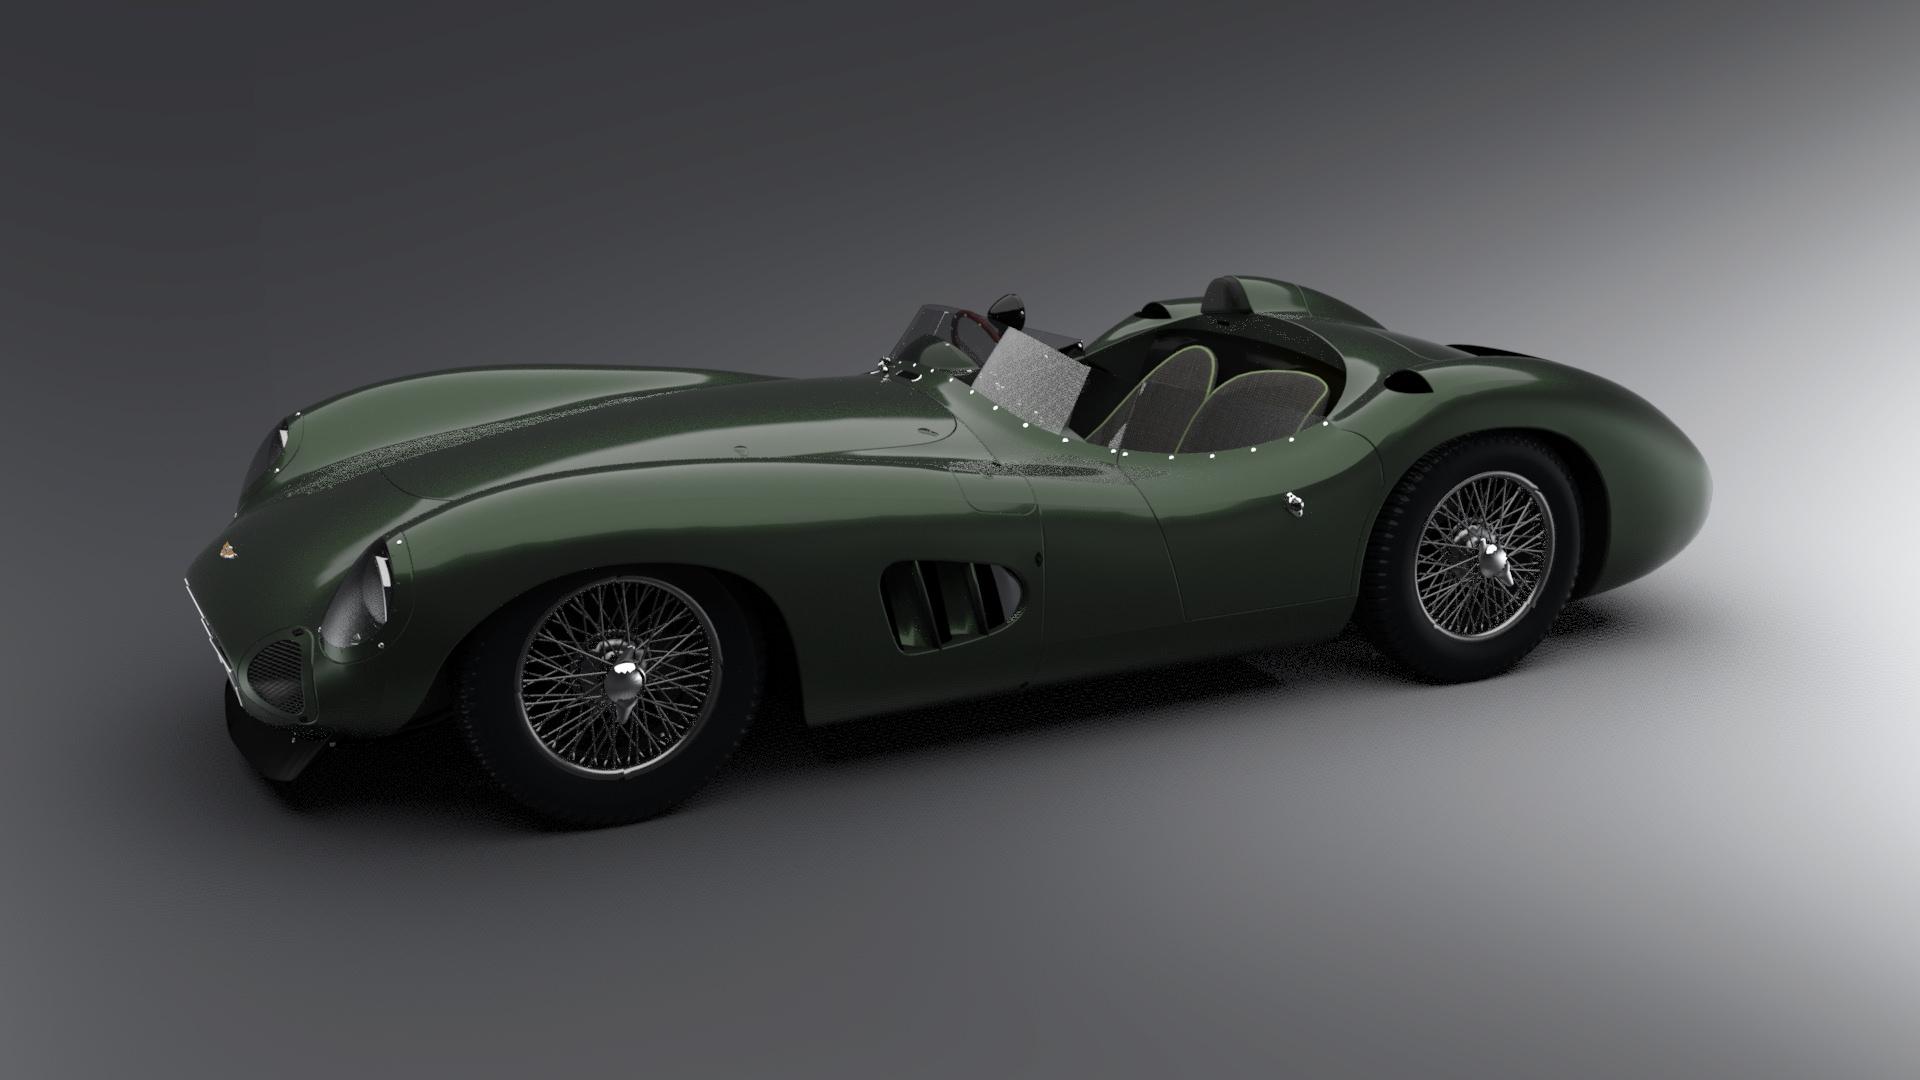 3d Model Aston Martin Racing Dbr1 Vintage Car Cgtrader